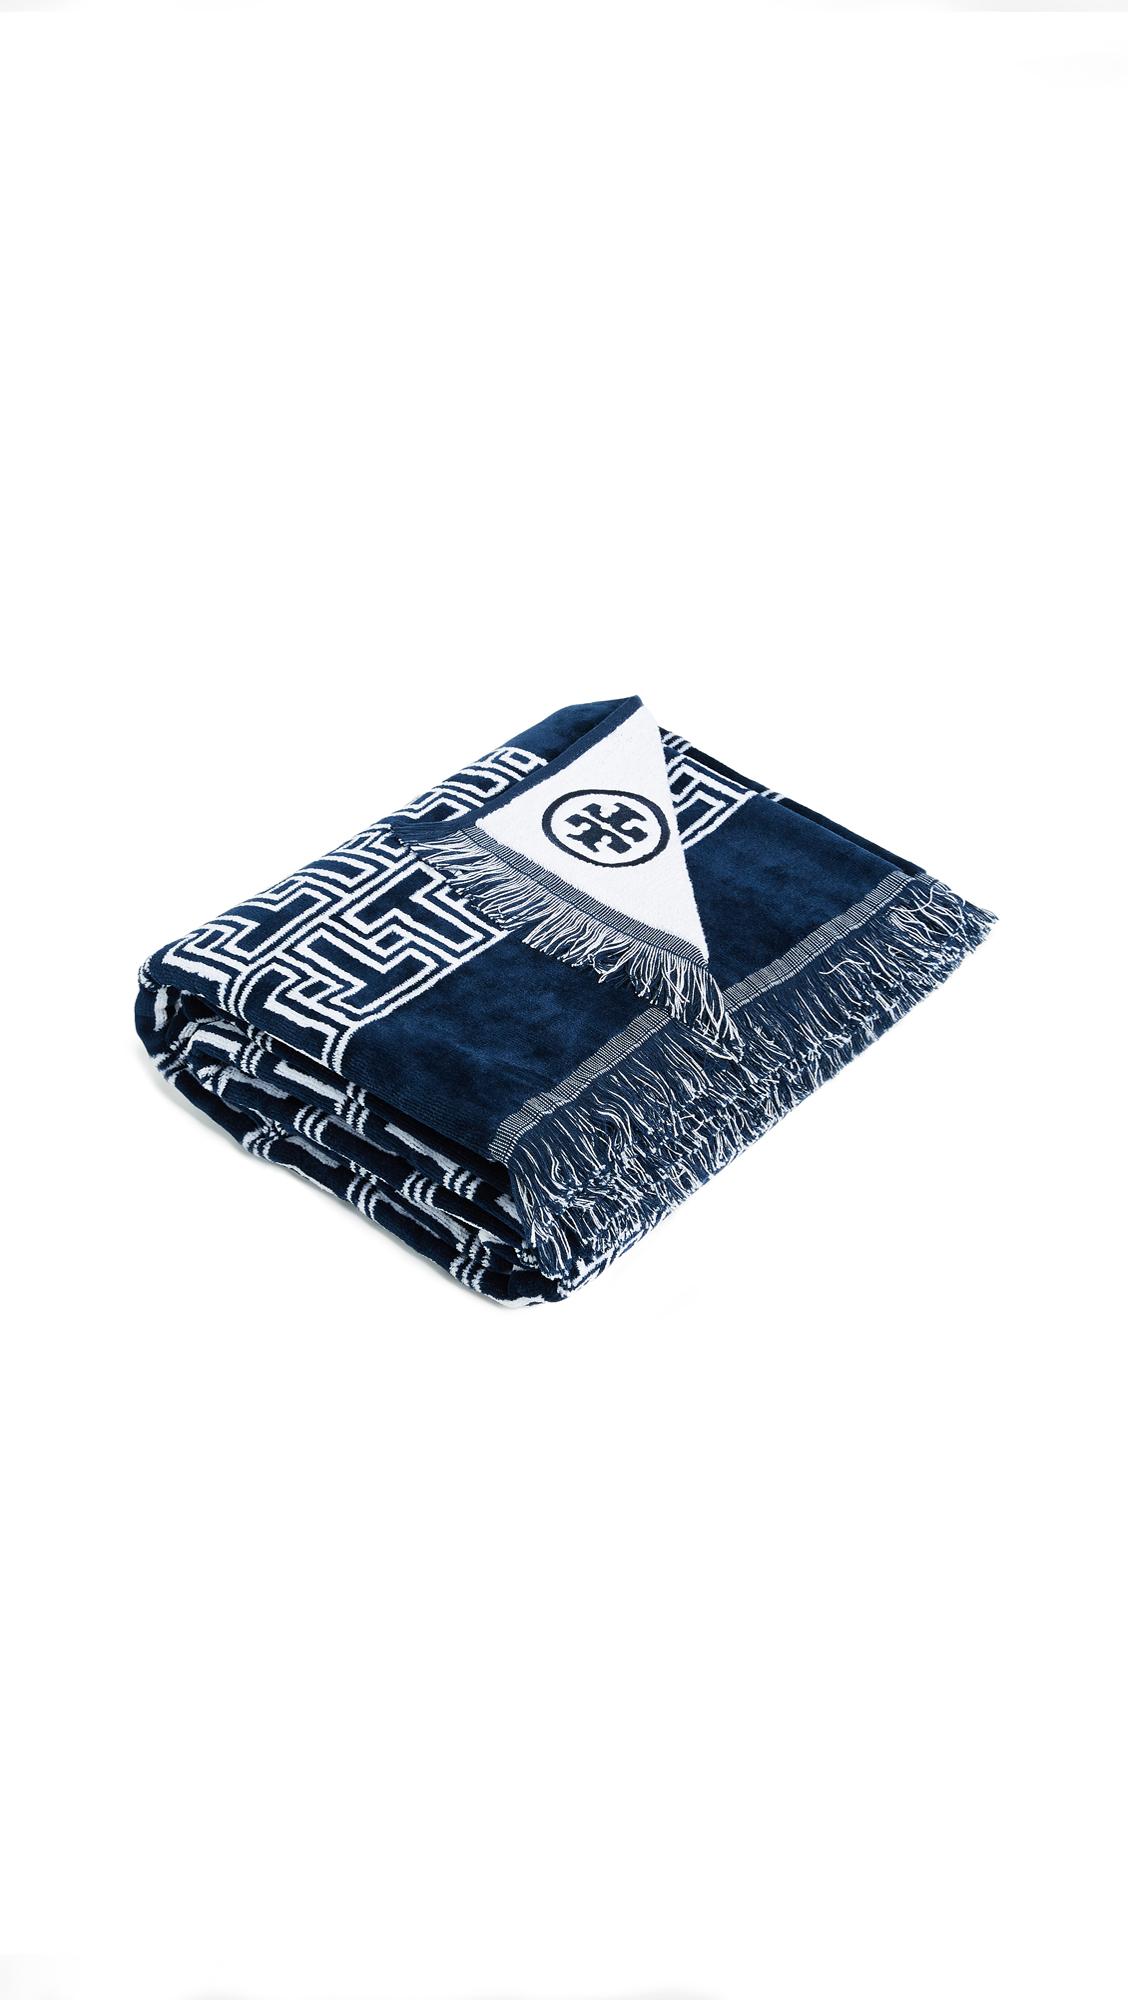 75c9d5fe52aa9 Tory Burch T Tile Beach Towel | SHOPBOP